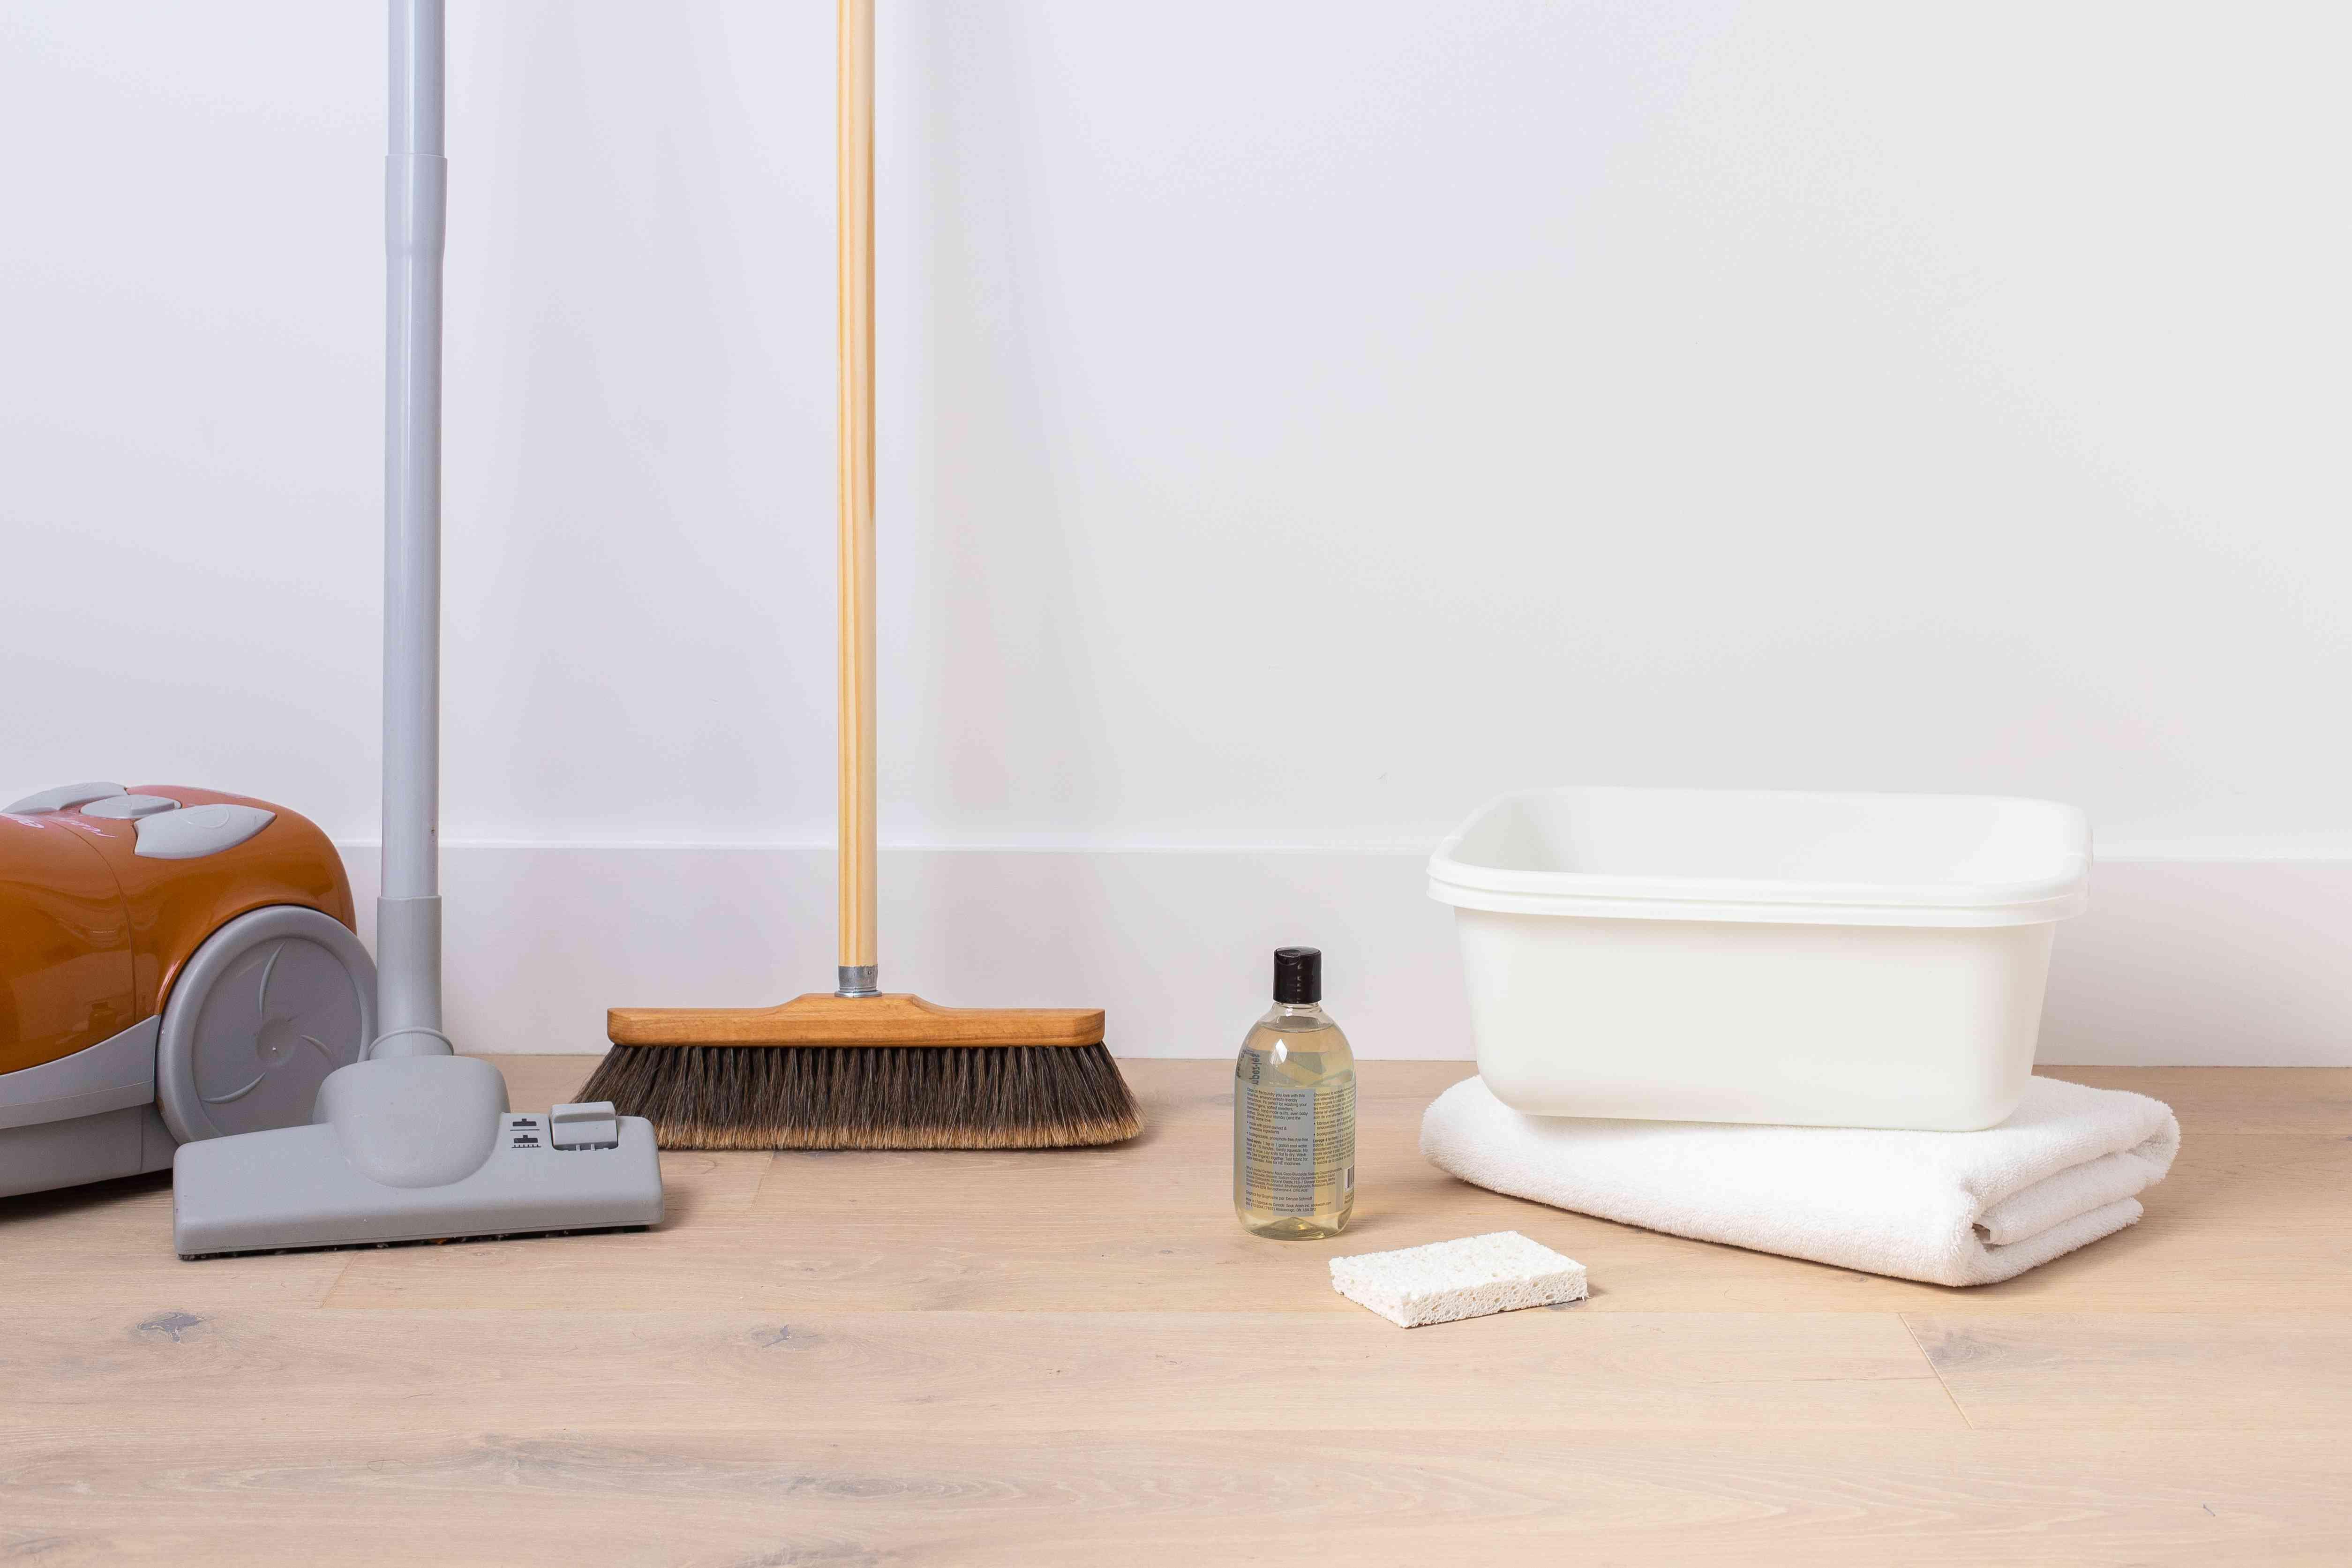 Broom, vacuum, bucket, folded towels, sponge and wool wash detergent materials cleaning wool rug